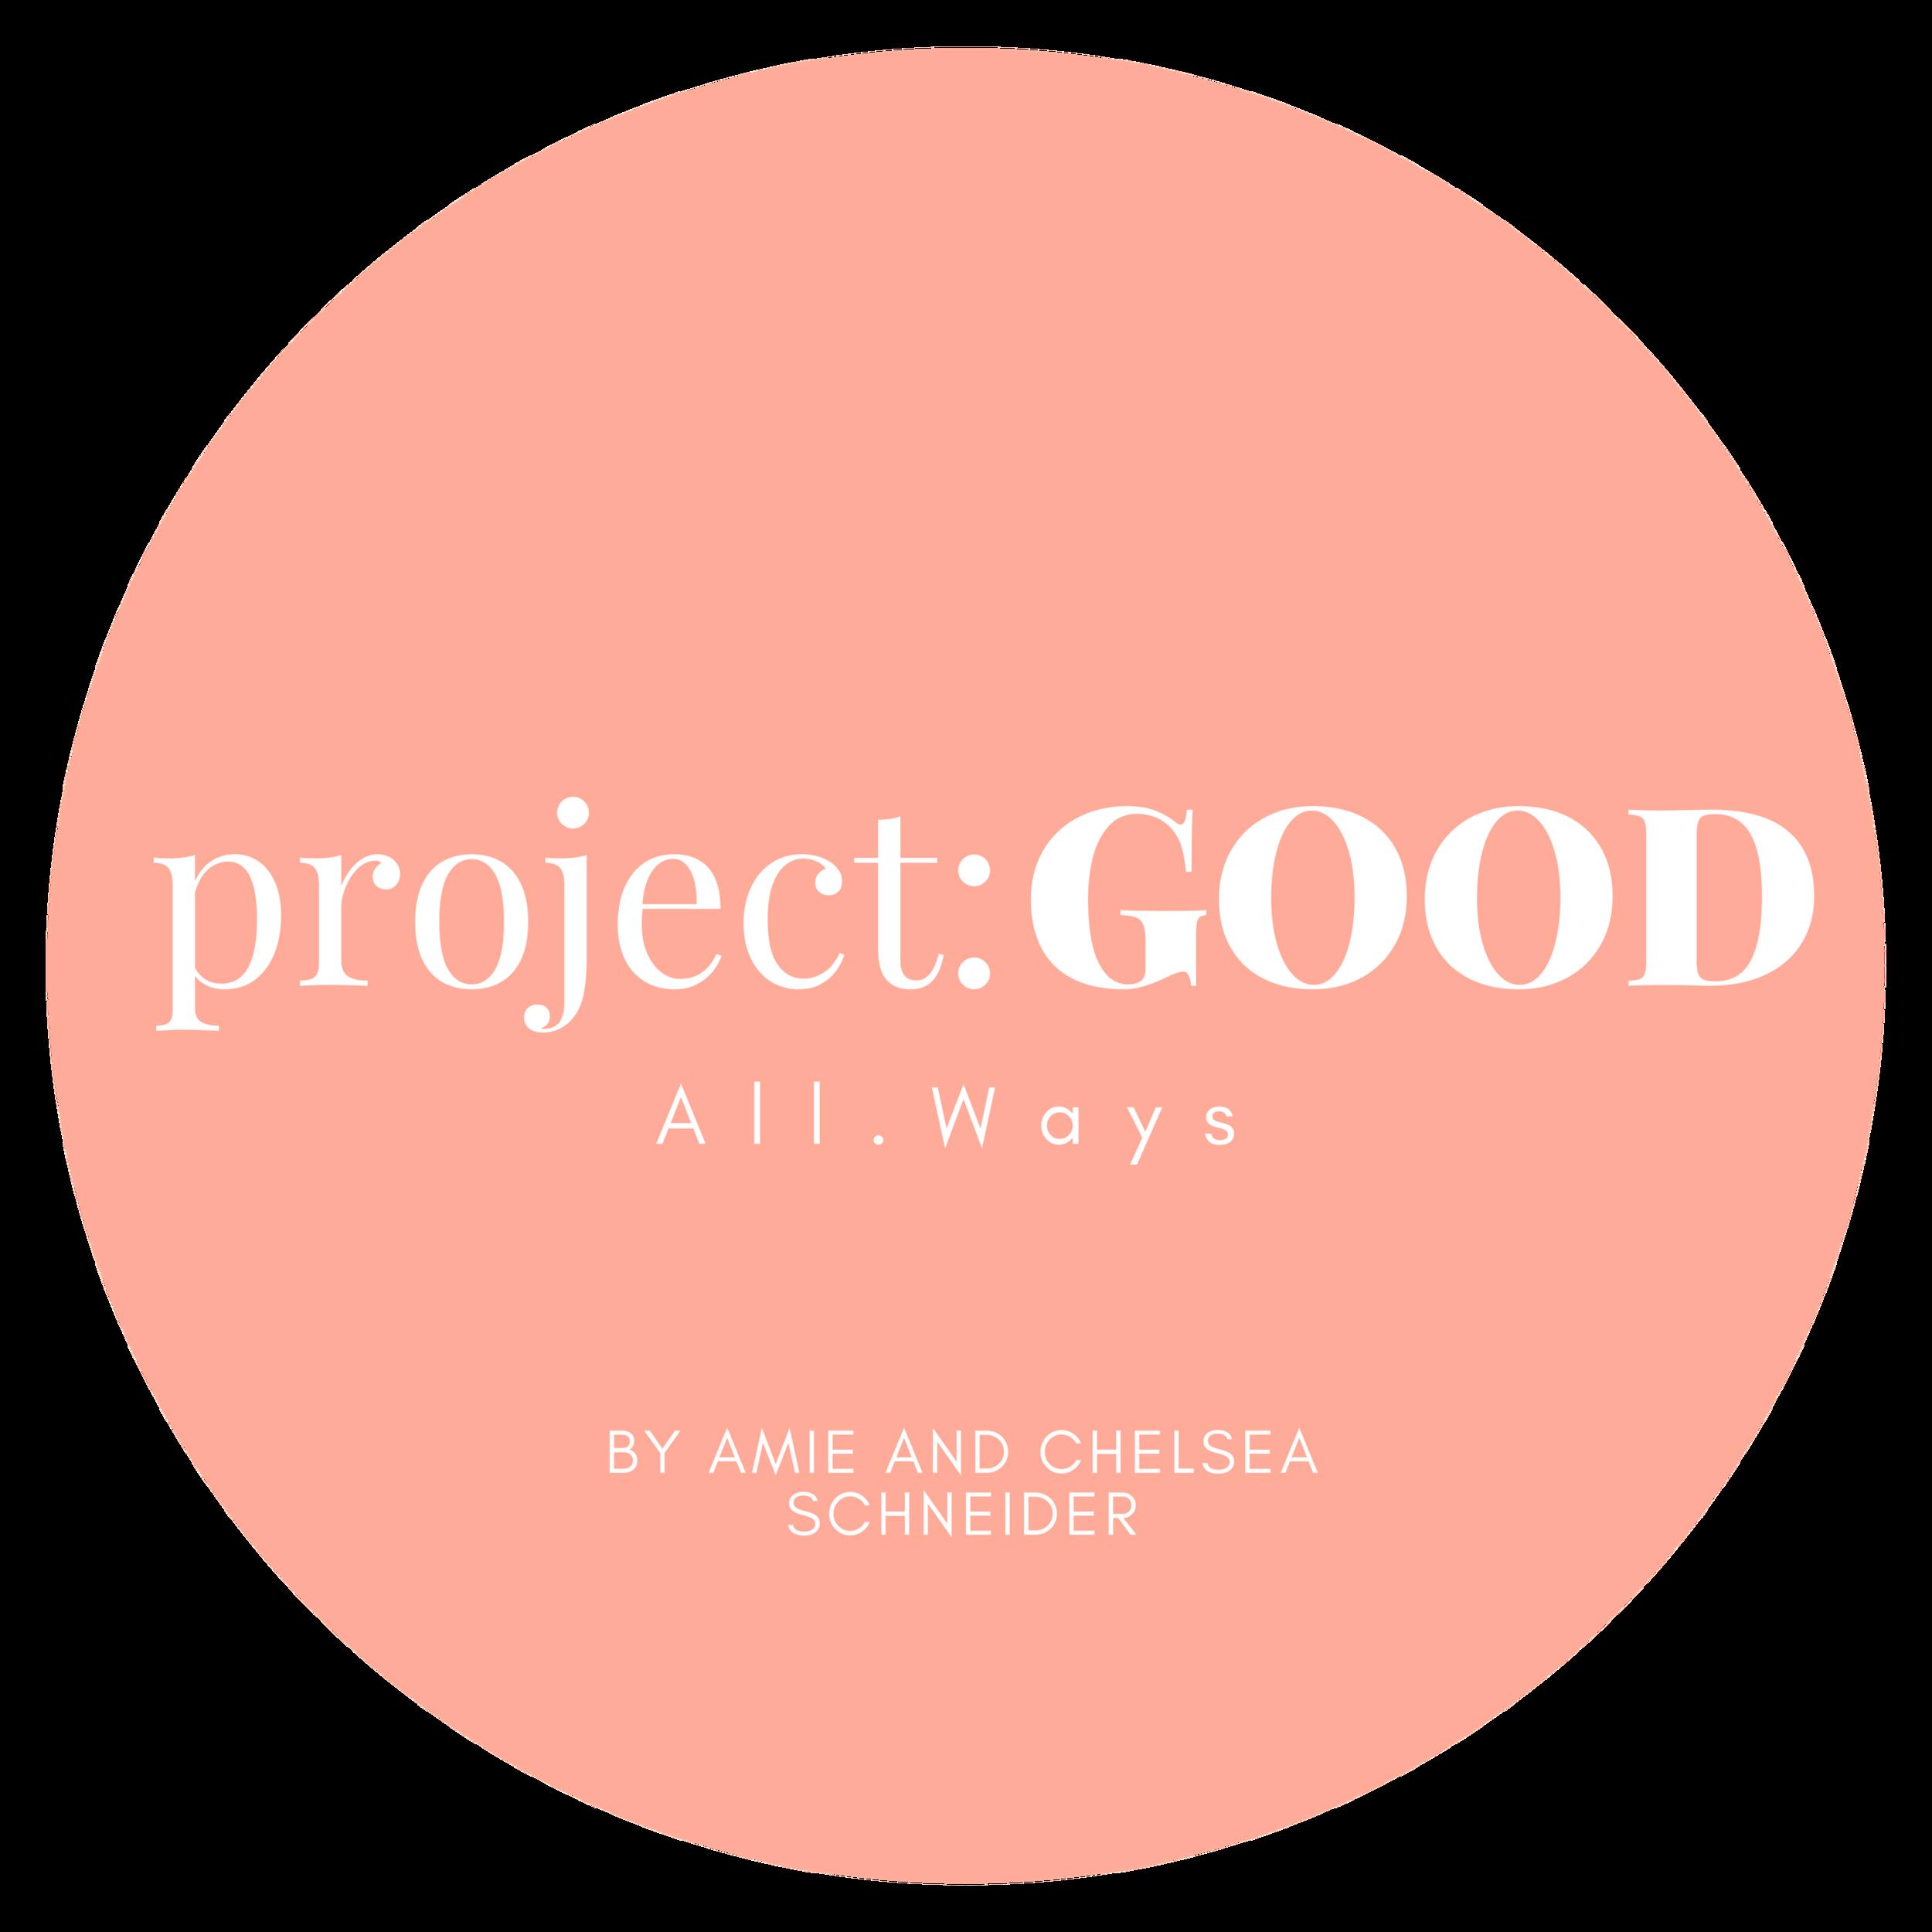 Project-Good-LA-Manhattan-Beach-Blogger-Velcro-Shoes-Be-Kind